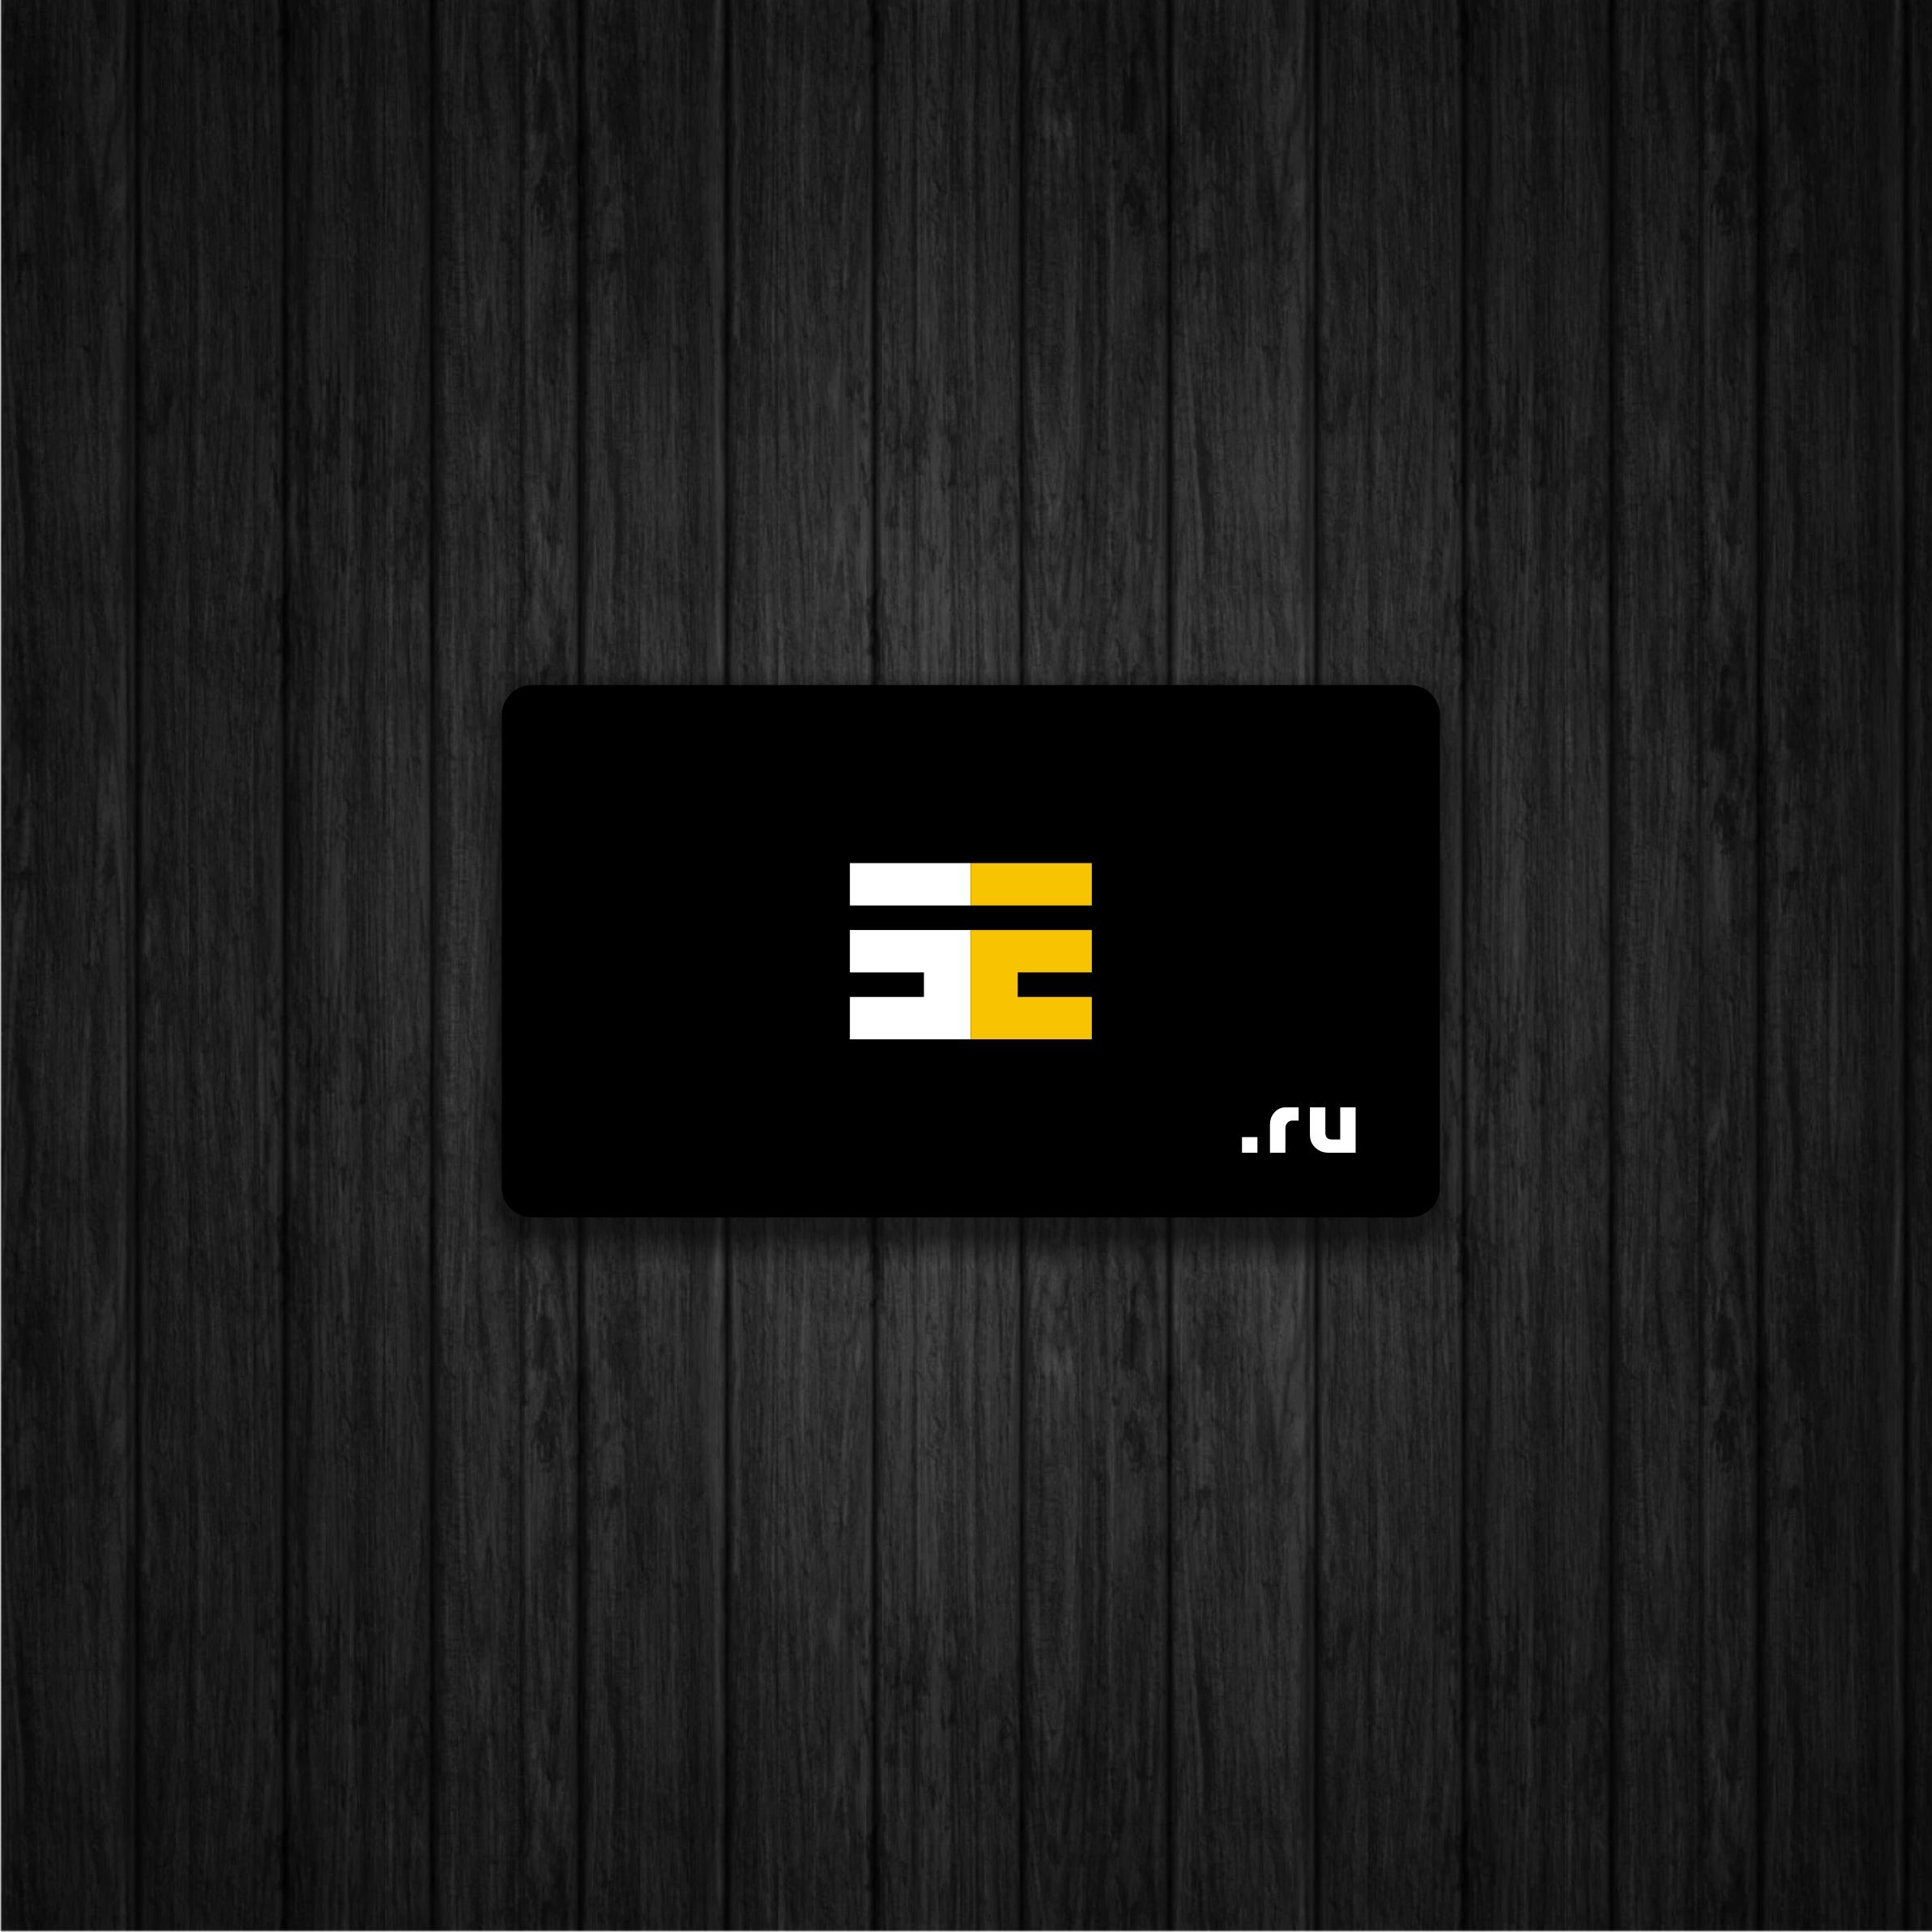 Нарисовать логотип для группы компаний  фото f_9055cdce8a298a20.jpg